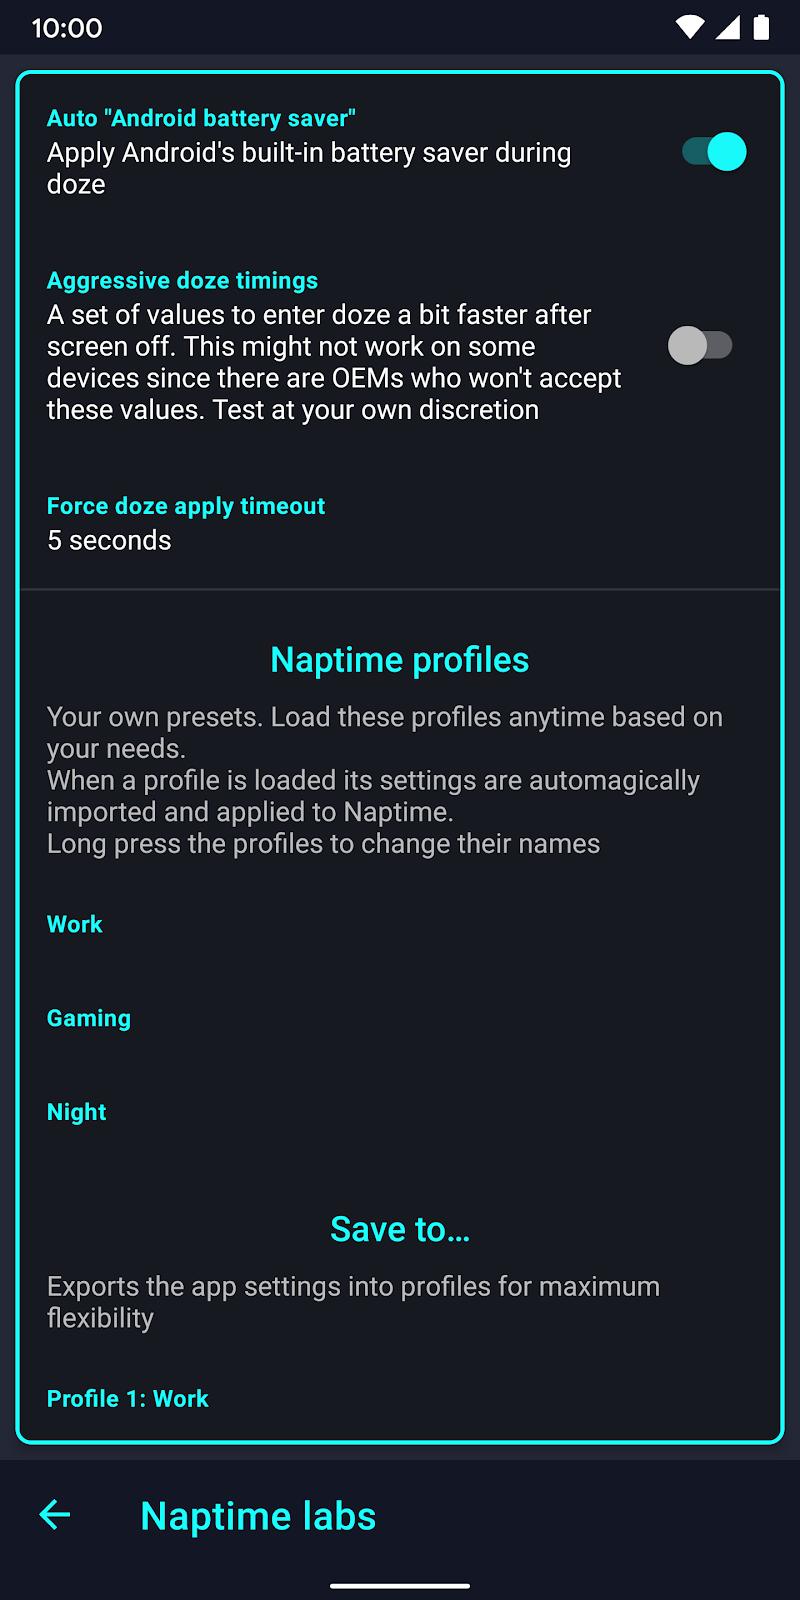 Naptime - the real battery saver Screenshot 2